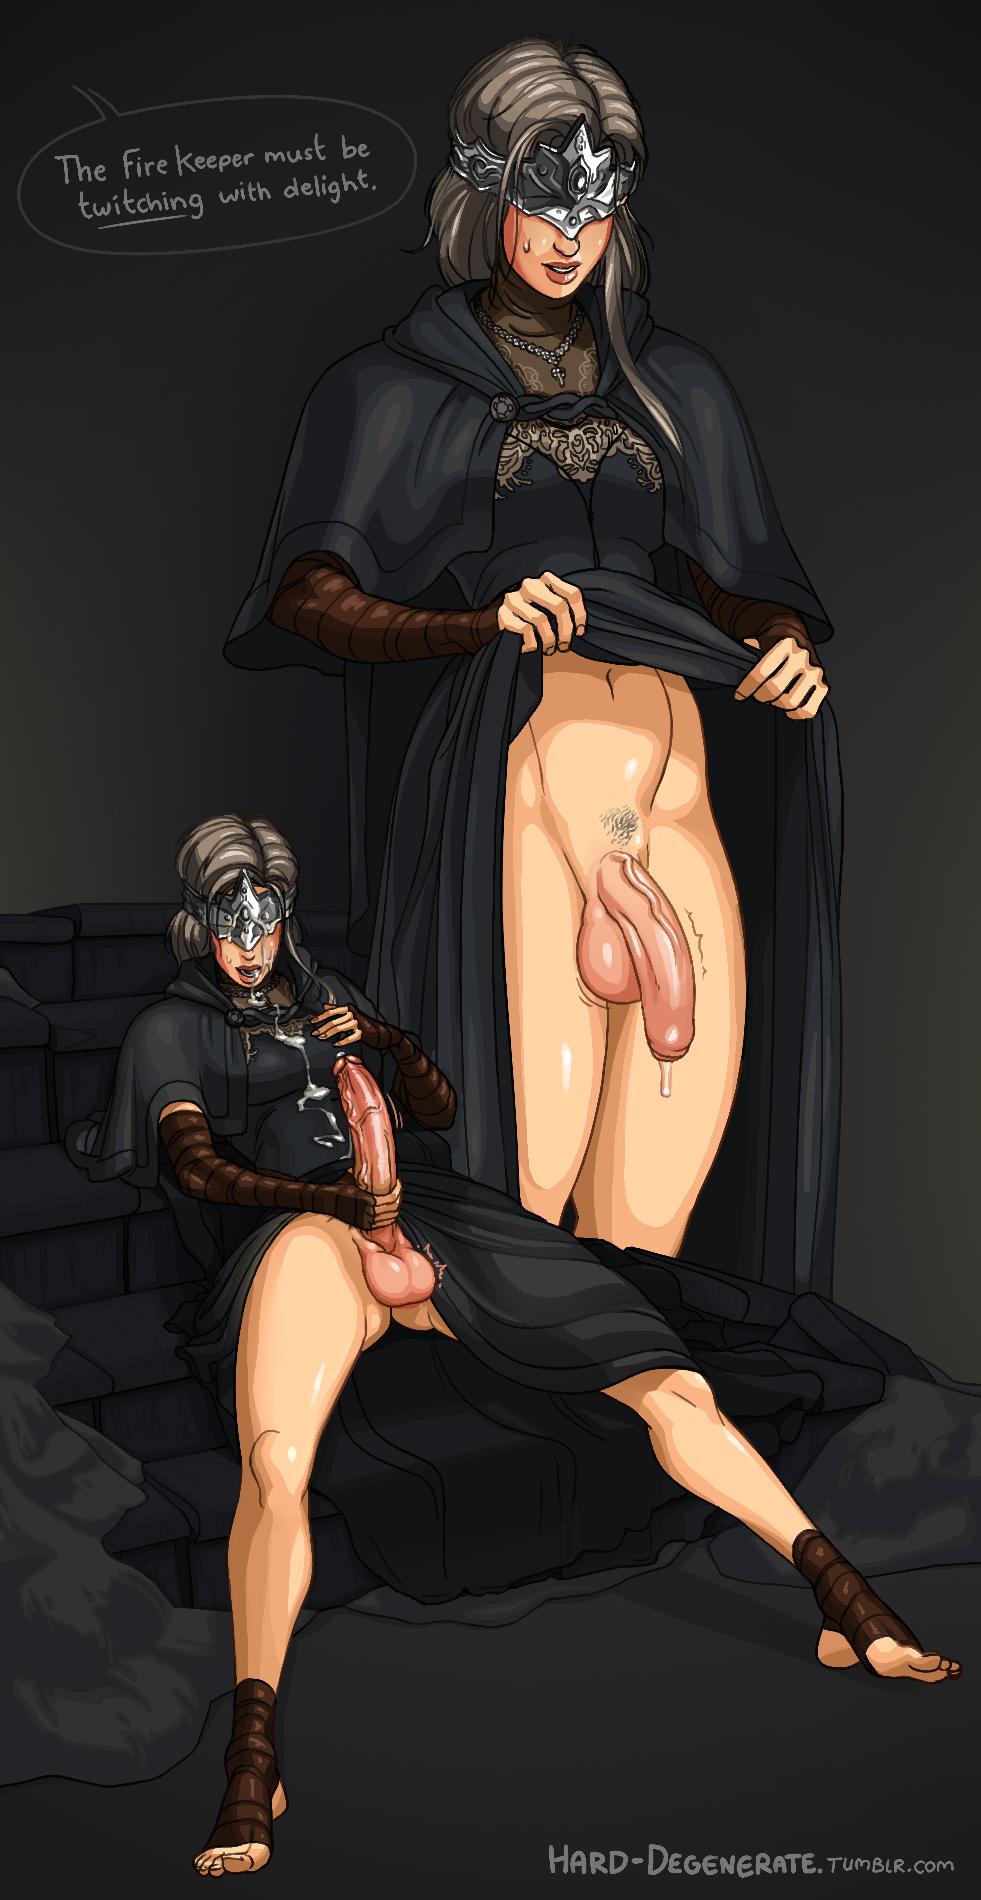 souls 3 dark robe fire keeper Blade of the immortal shira